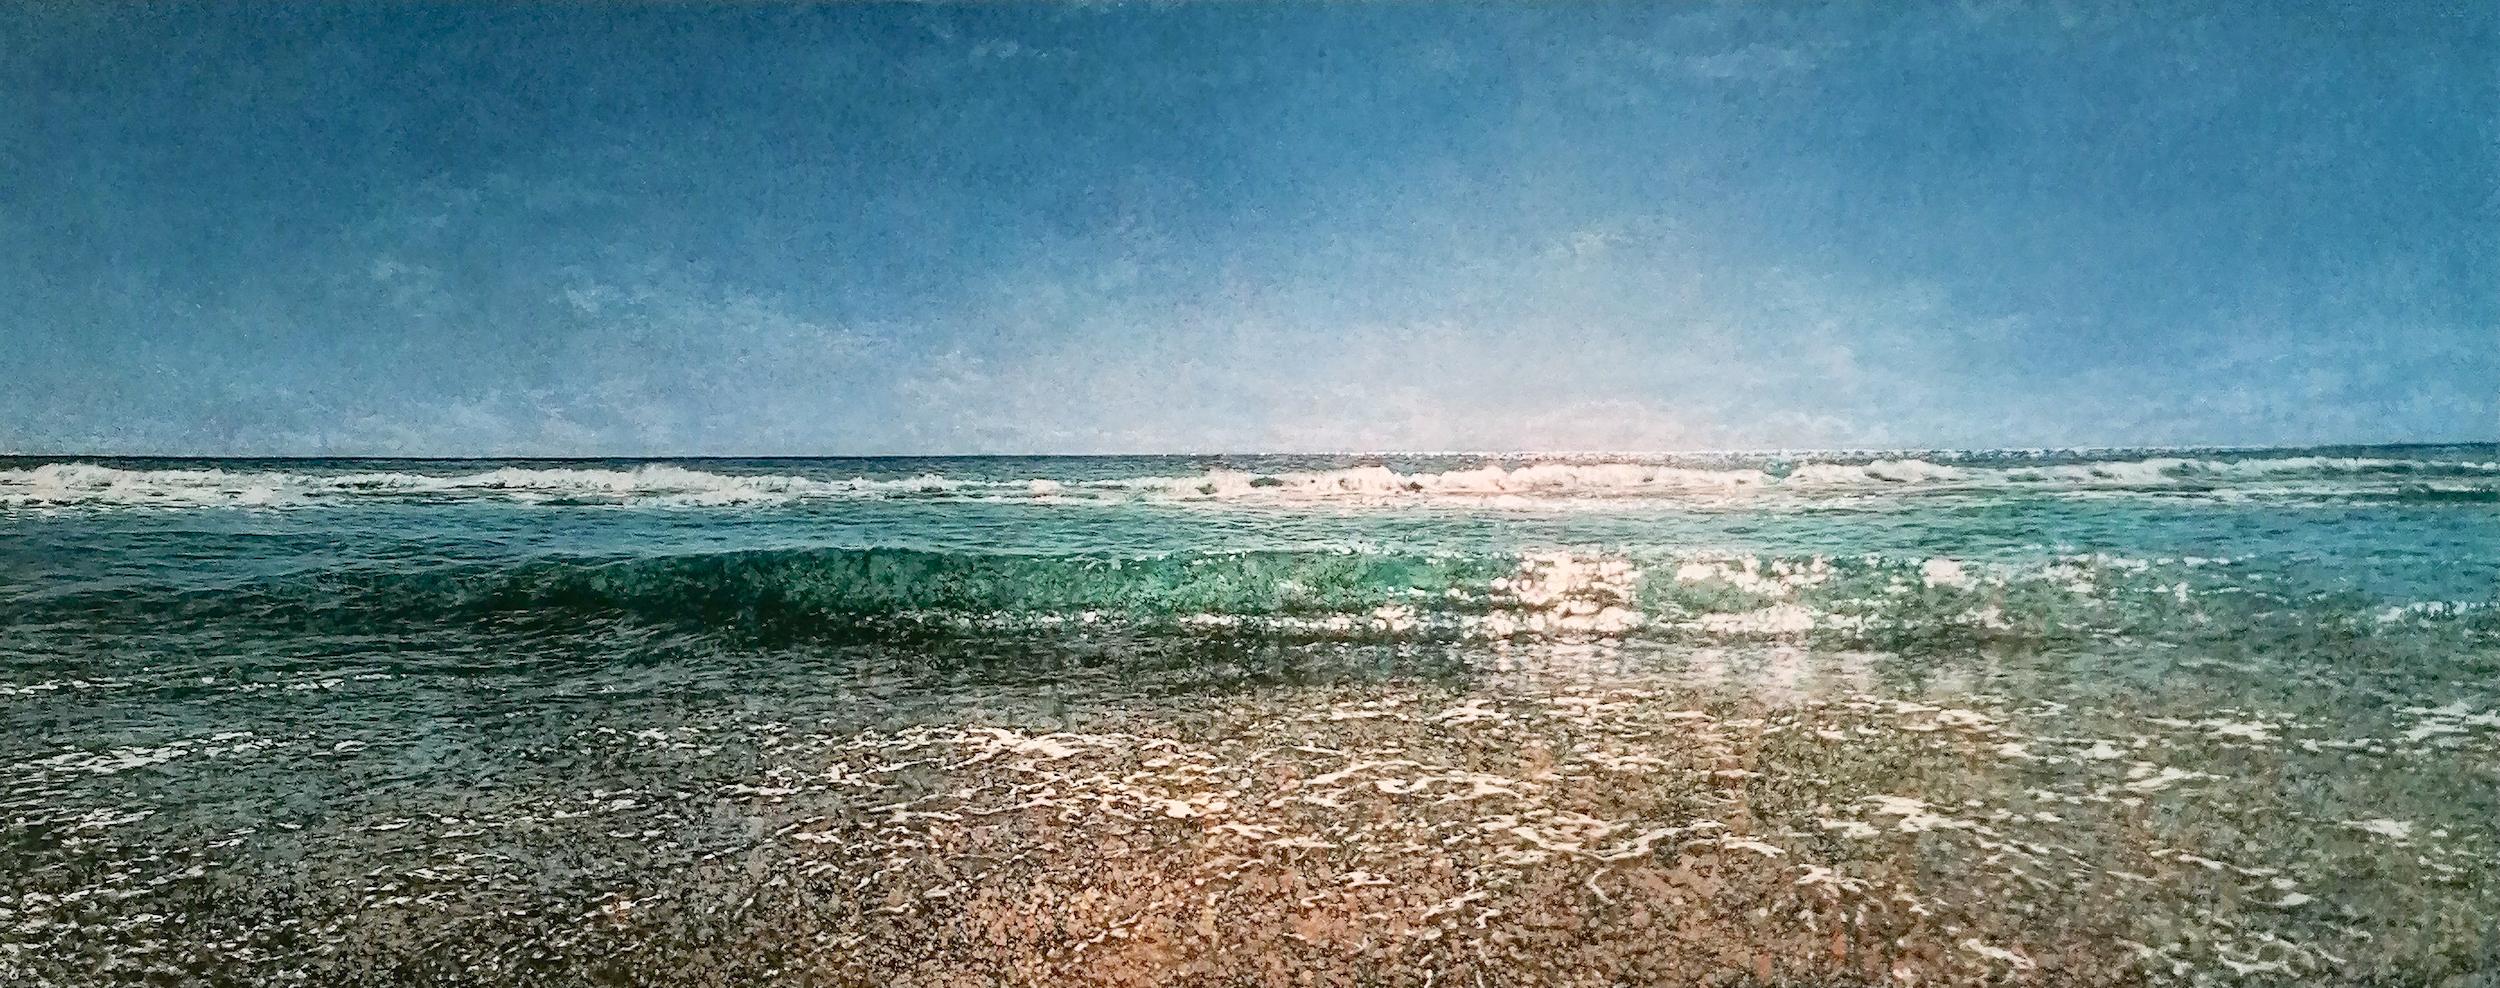 Robert Arató: Seascape 5, Druck auf Leinwand, gefirnisst, 140 x 57 cm, 950 Eur